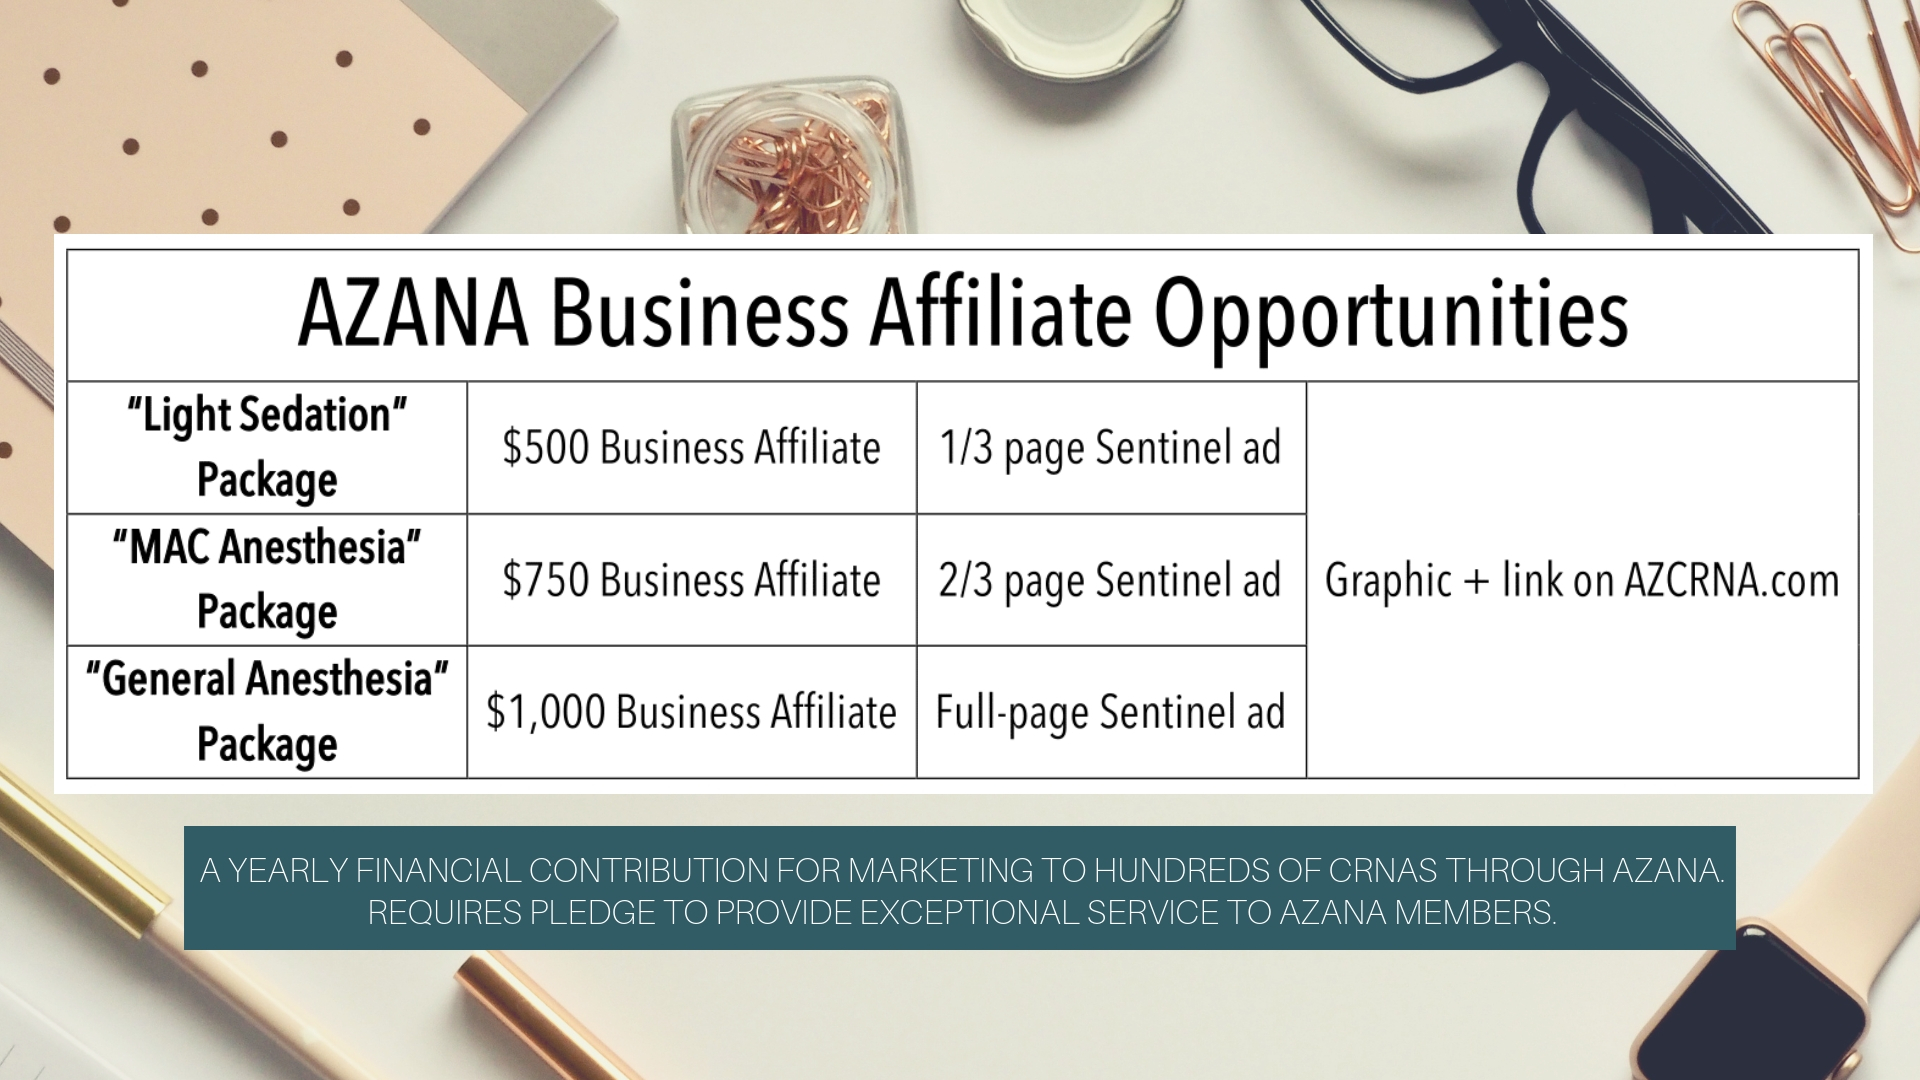 AZANA Business Affiliate Opportunities.jpg